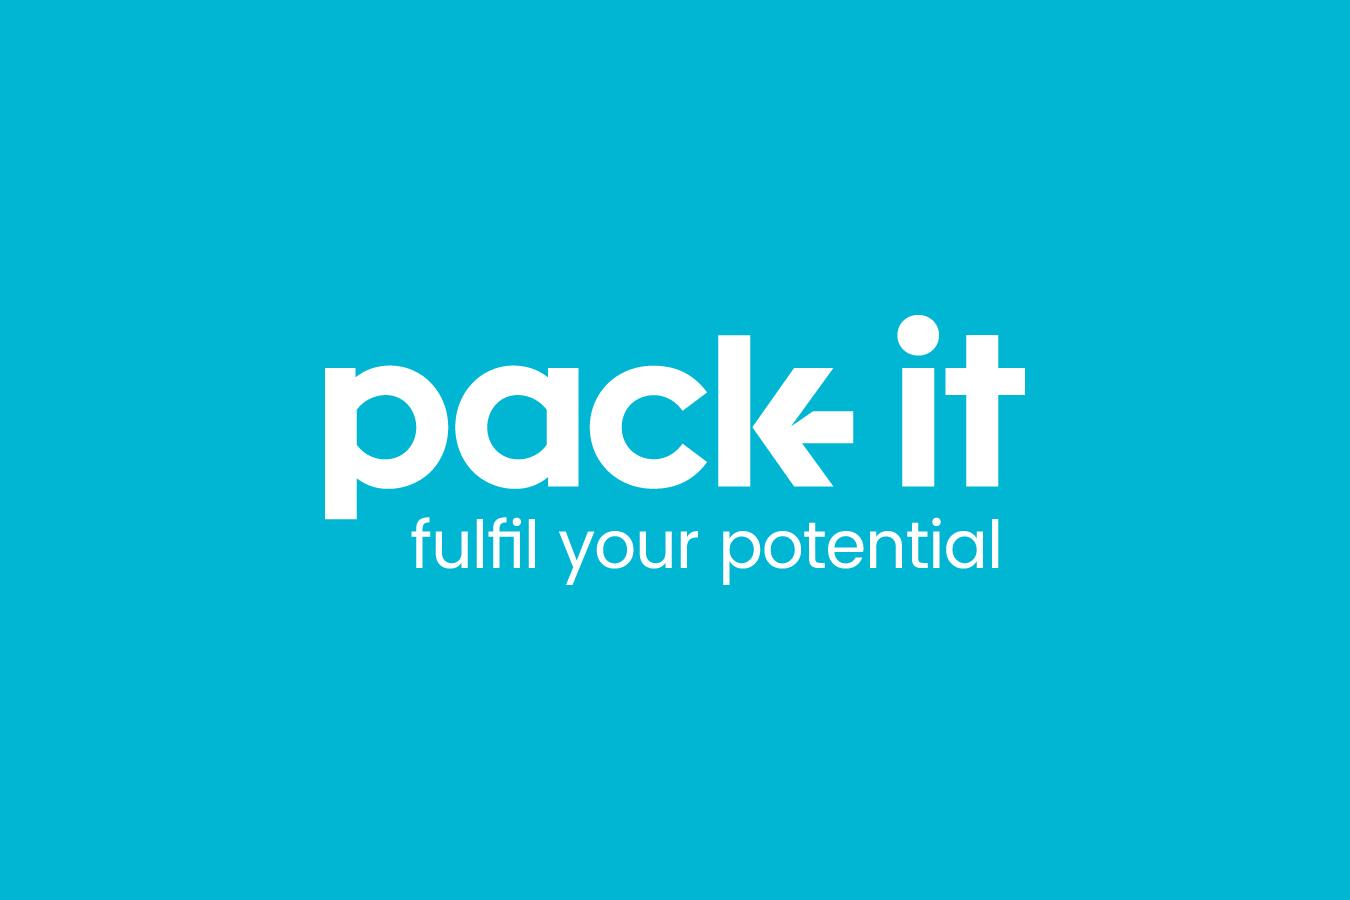 2-pack-it-logo-background.jpg